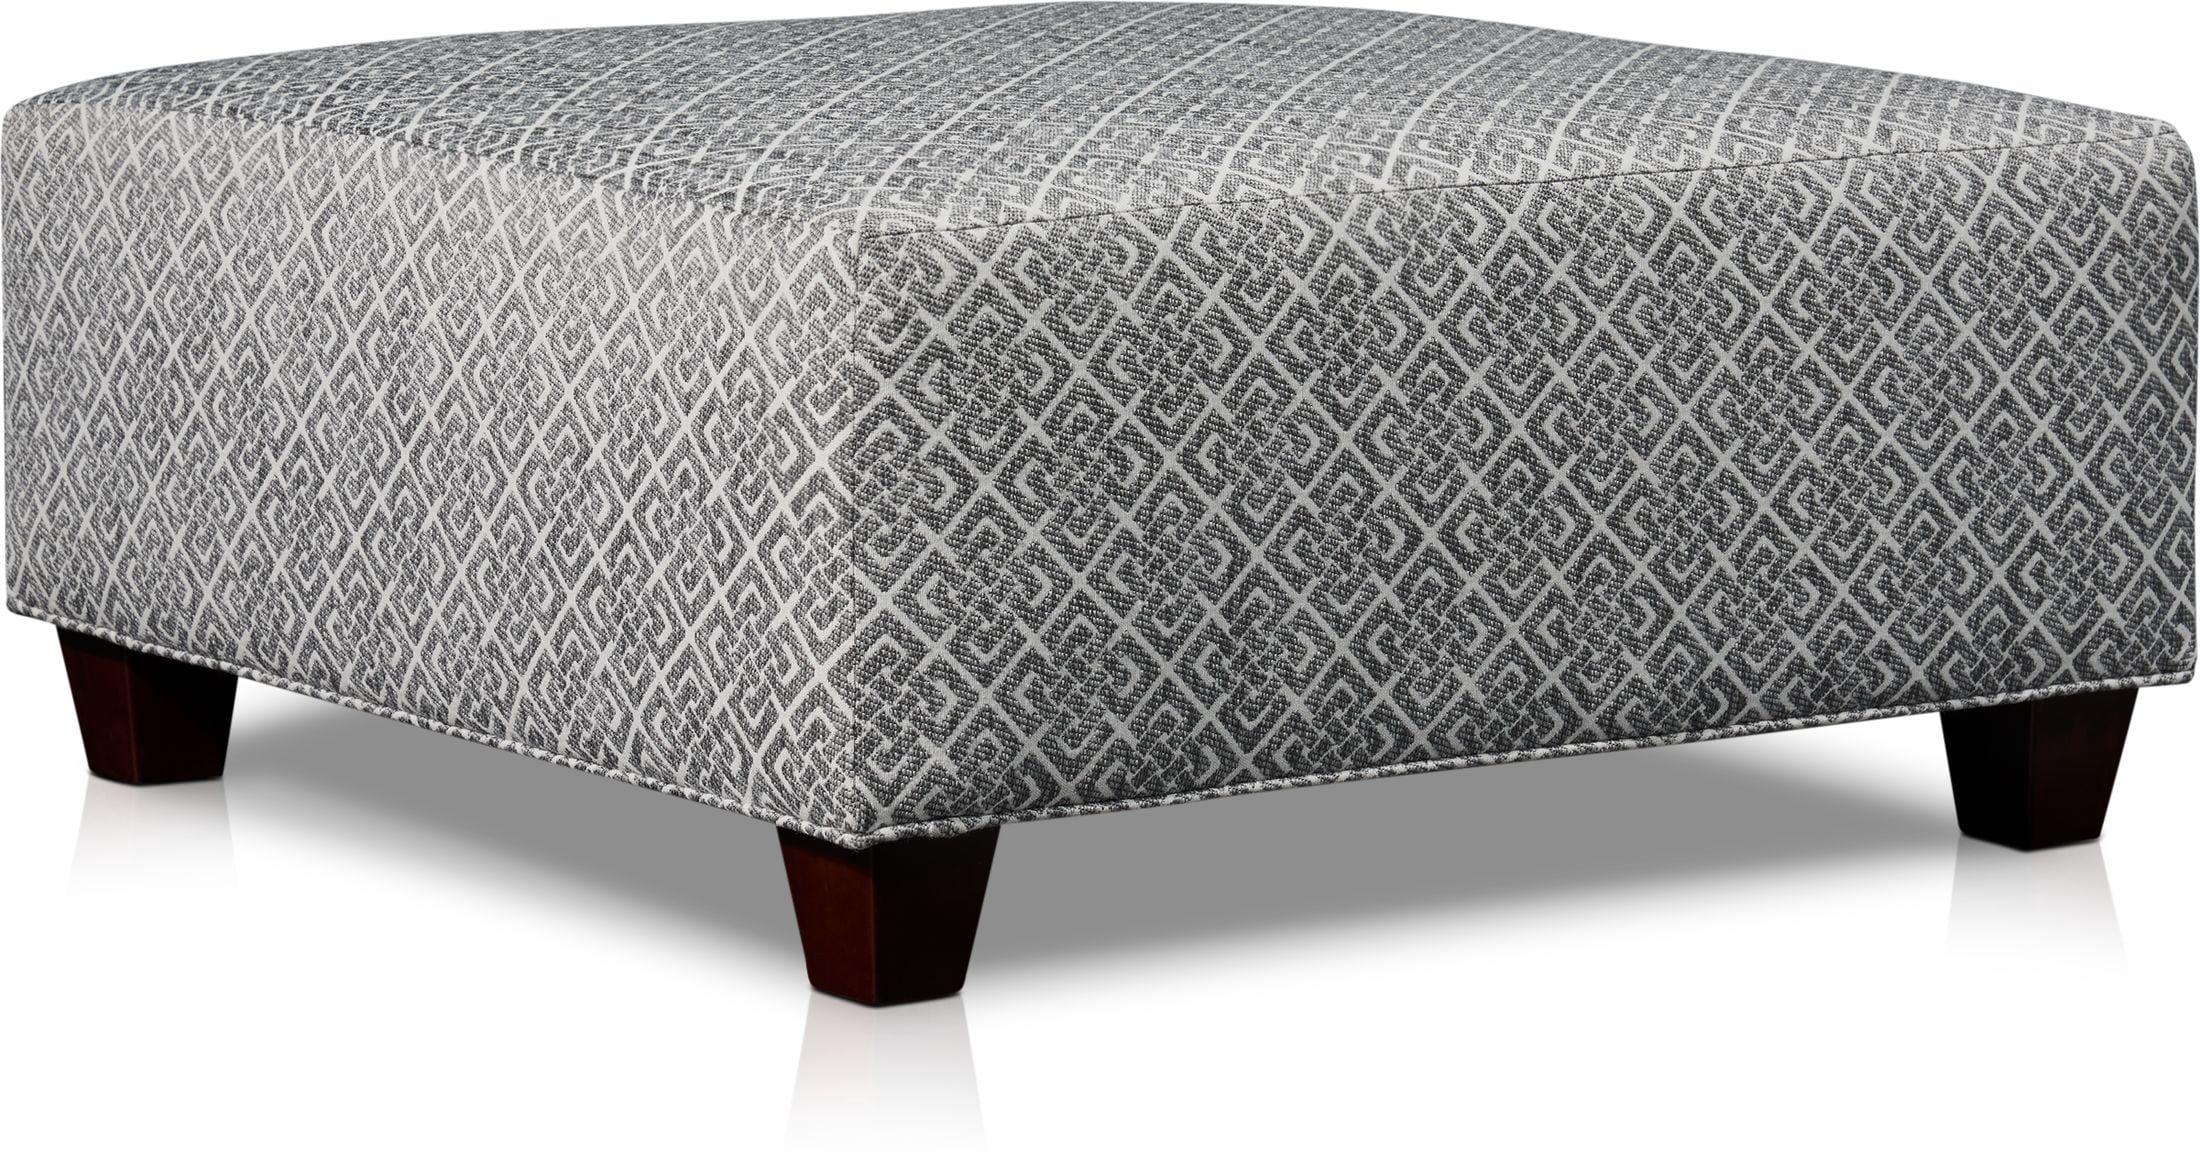 Living Room Furniture - Camila Ottoman